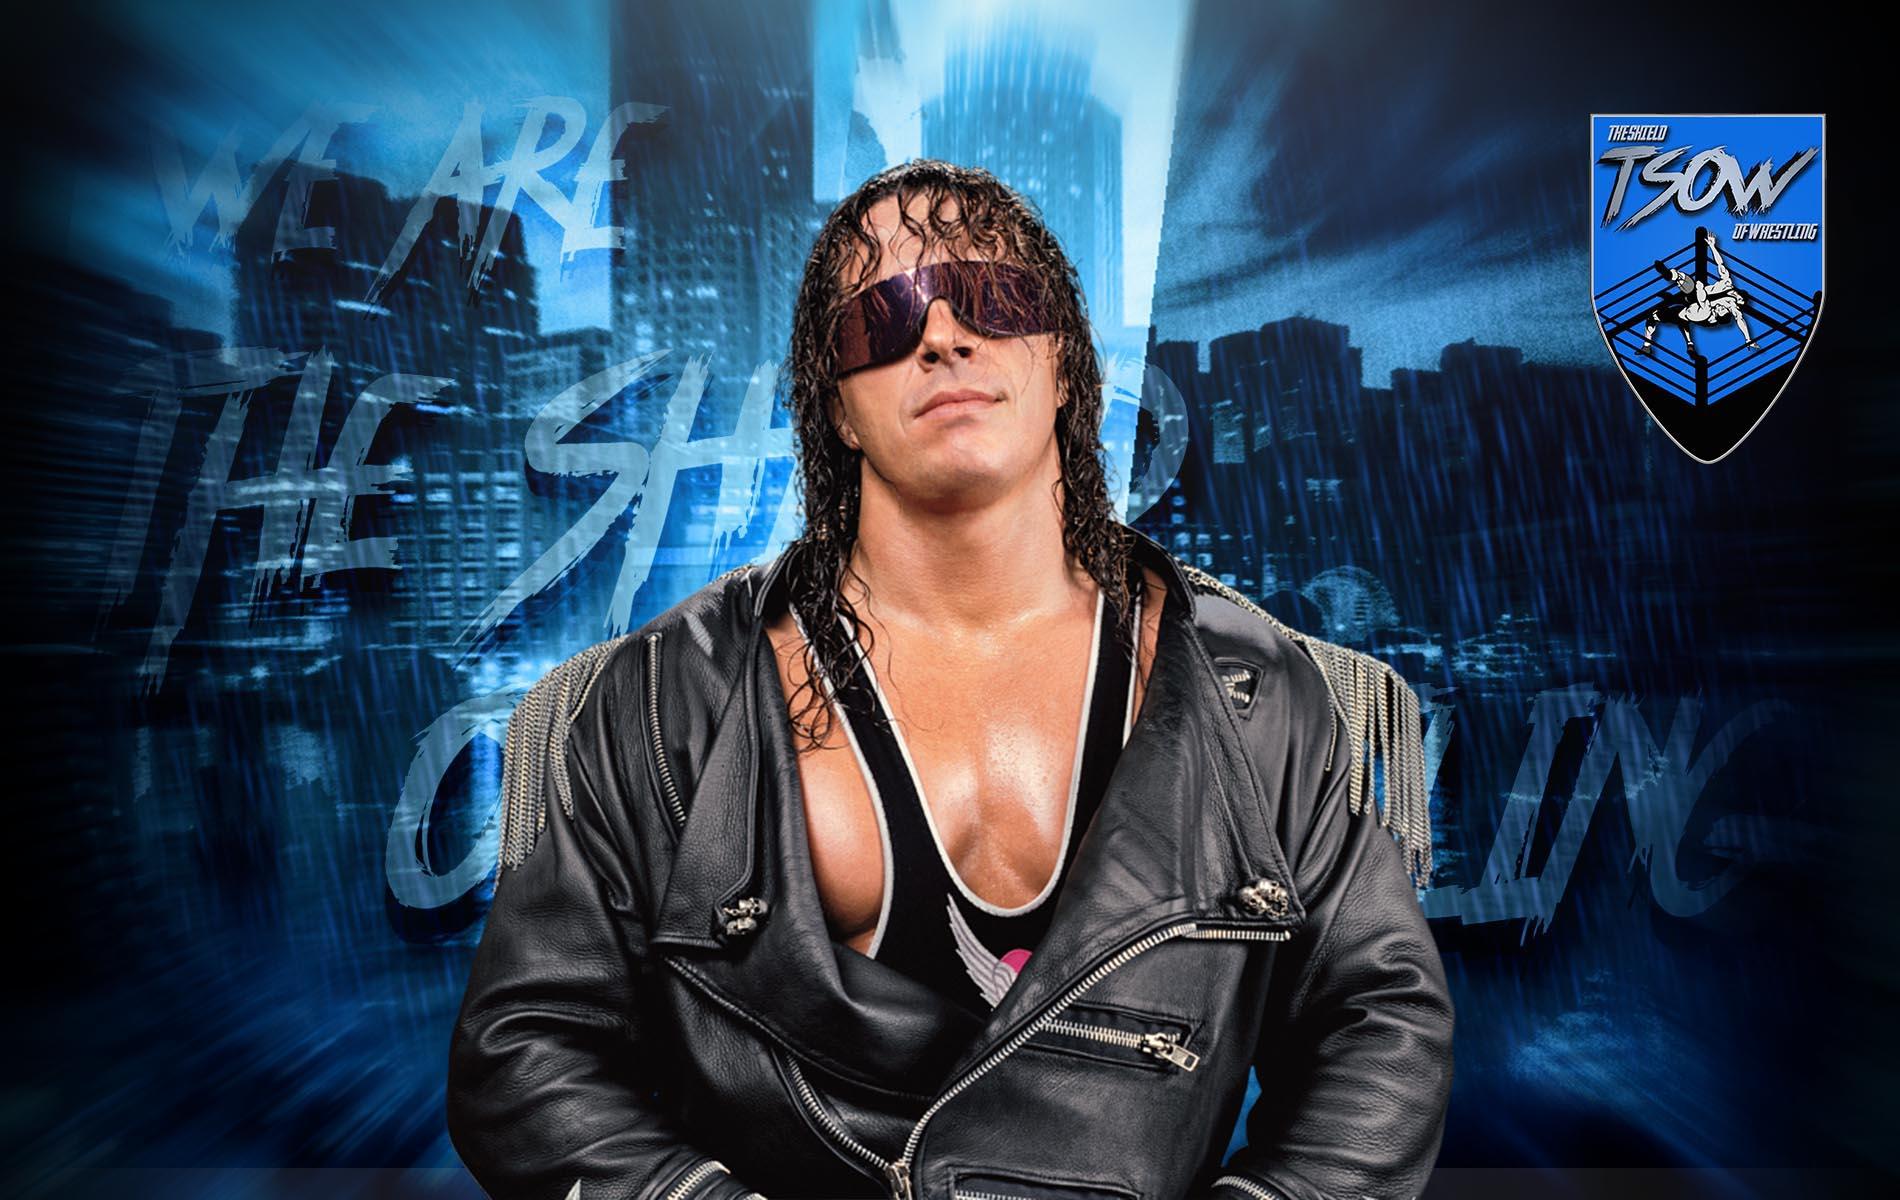 Bret Hart: Jake Roberts voleva sabotare il match con The Undertaker